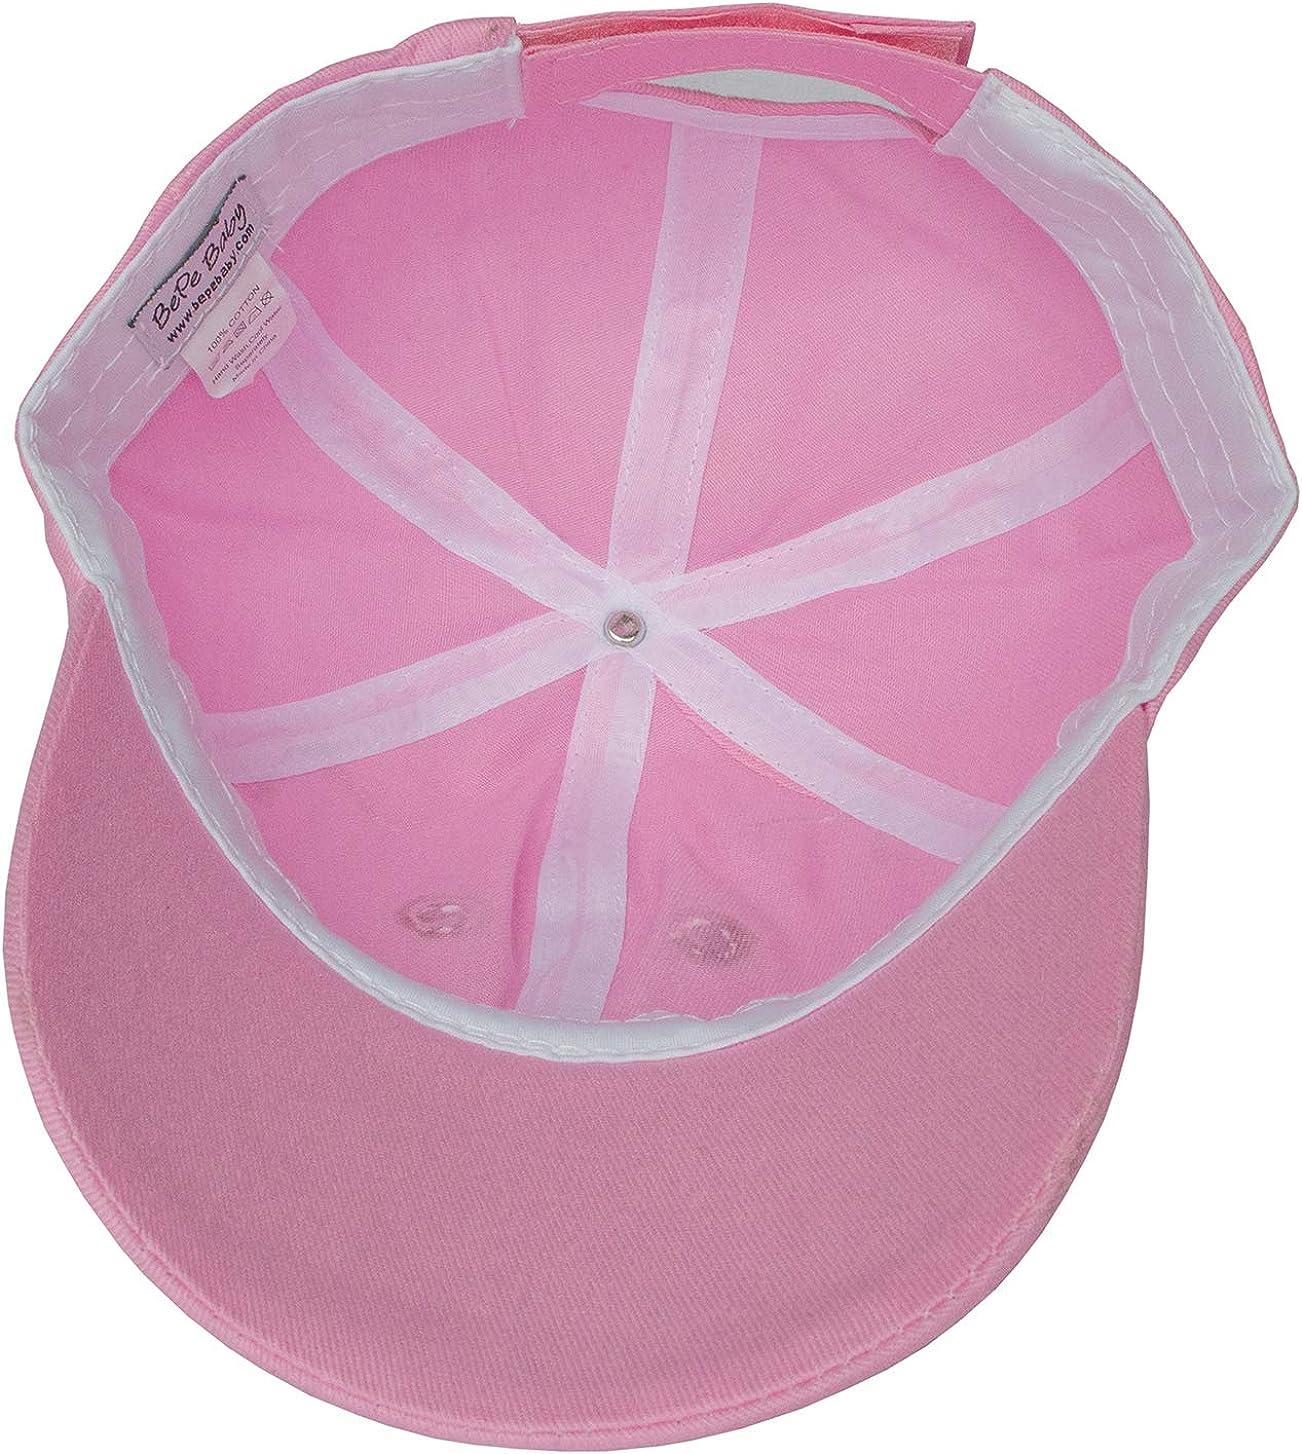 BePe Baby Little Girls Kids Toddler Sun Protection Beach Kitty Cat Summer Baseball Cap Hat Pink 2 to 4 Years